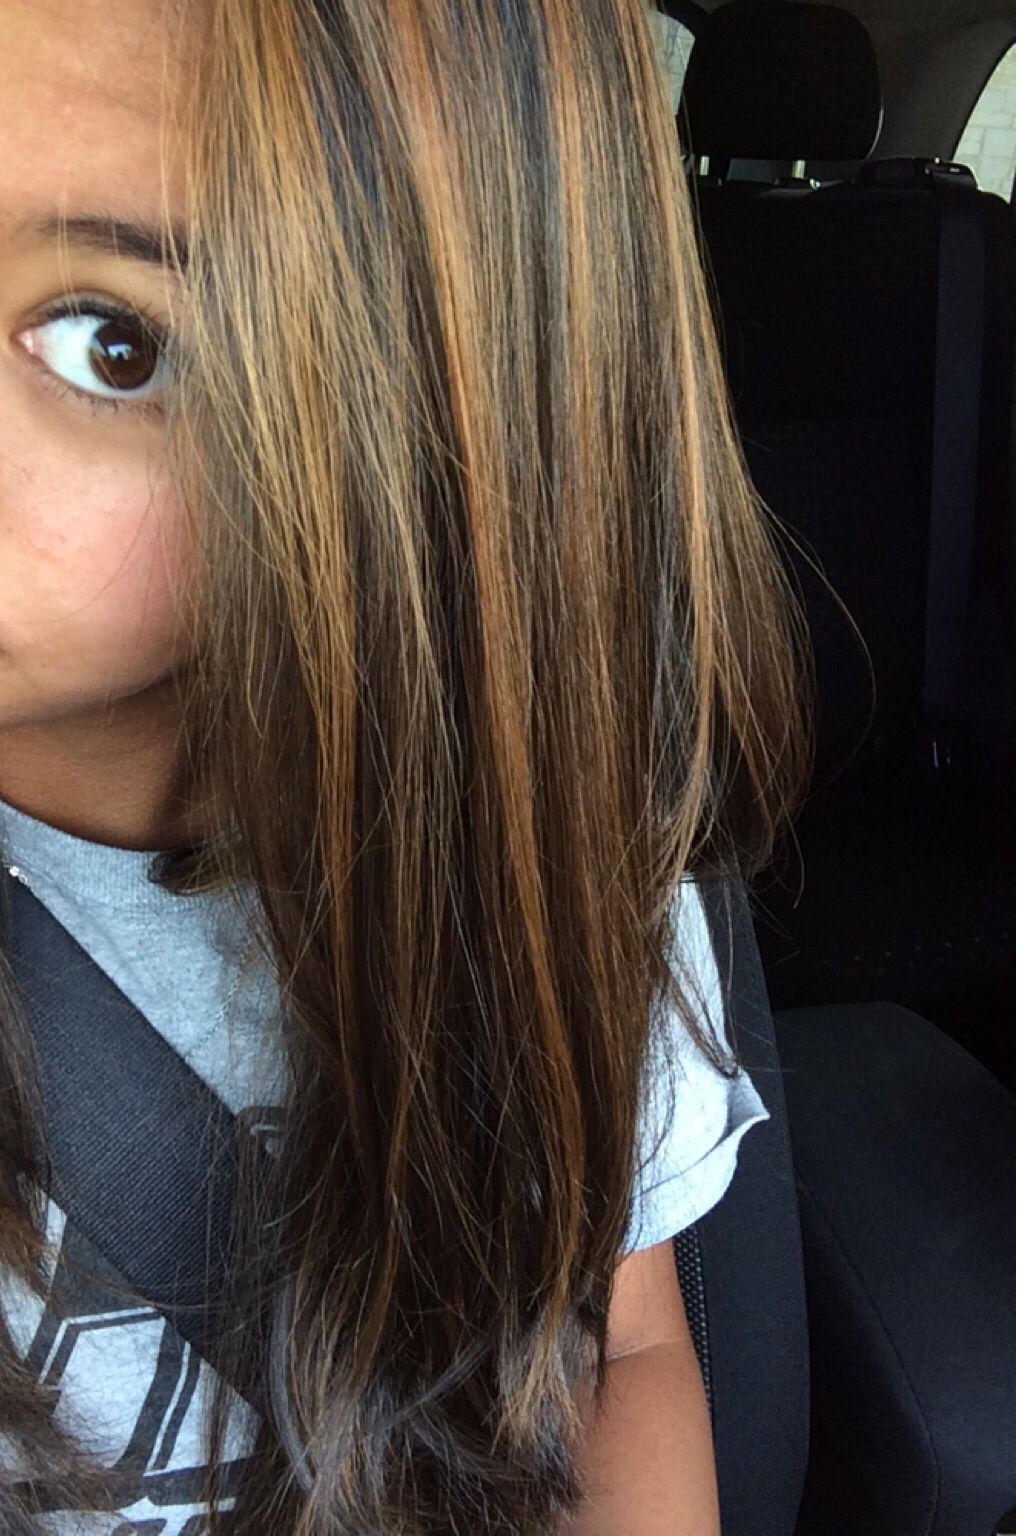 Light Highlights For Dark Brown Hair Thin Layers Of Light Brown In Dark Brown Or Black H Highlights For Dark Brown Hair Hair Color Highlights Long Hair Styles